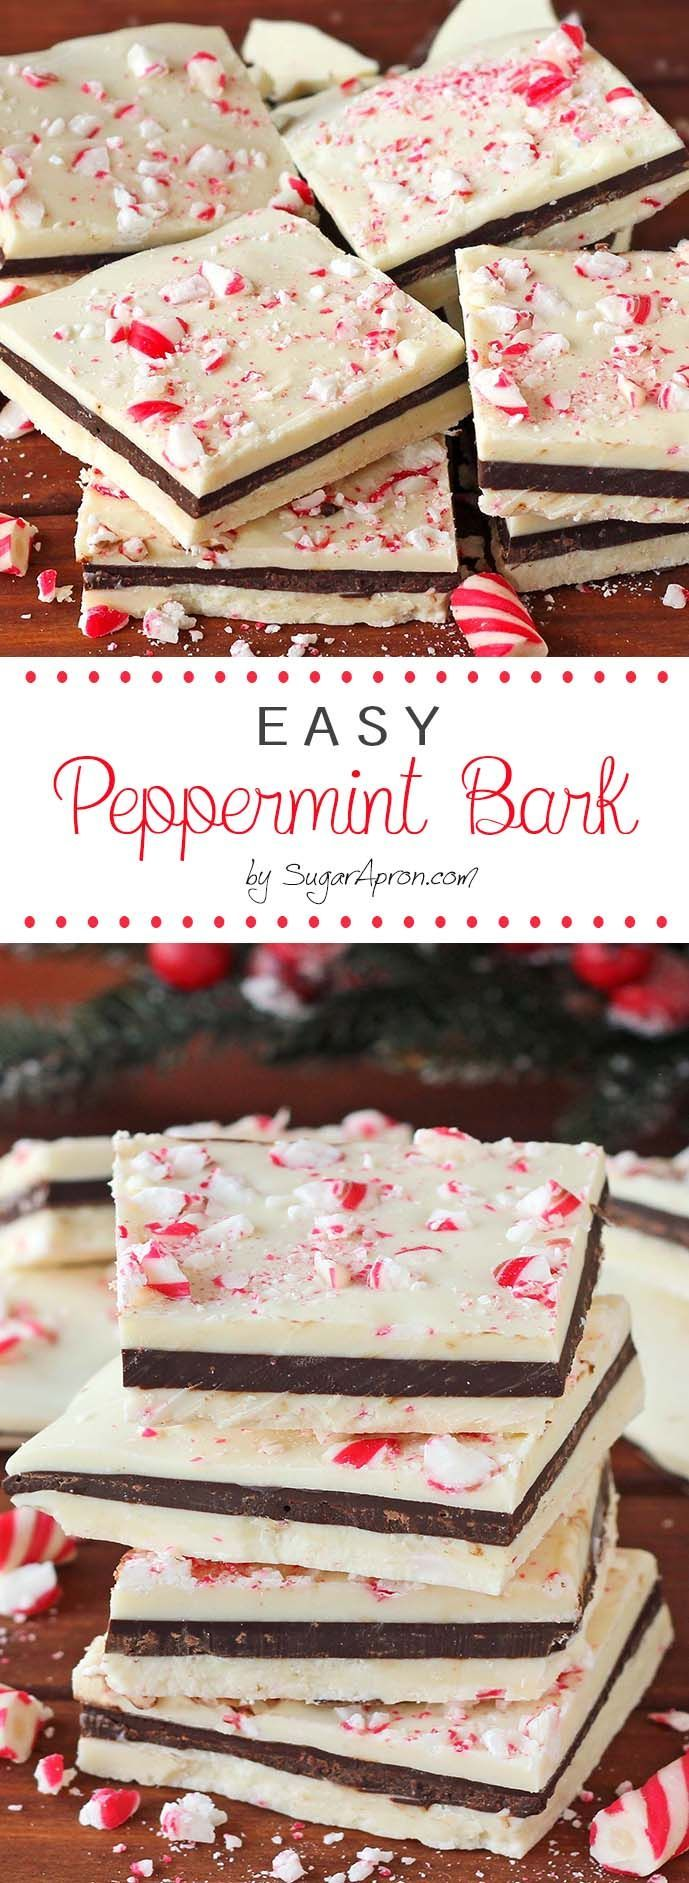 An unbelievably easy, no-fuss, christmas peppermint bark recipe.